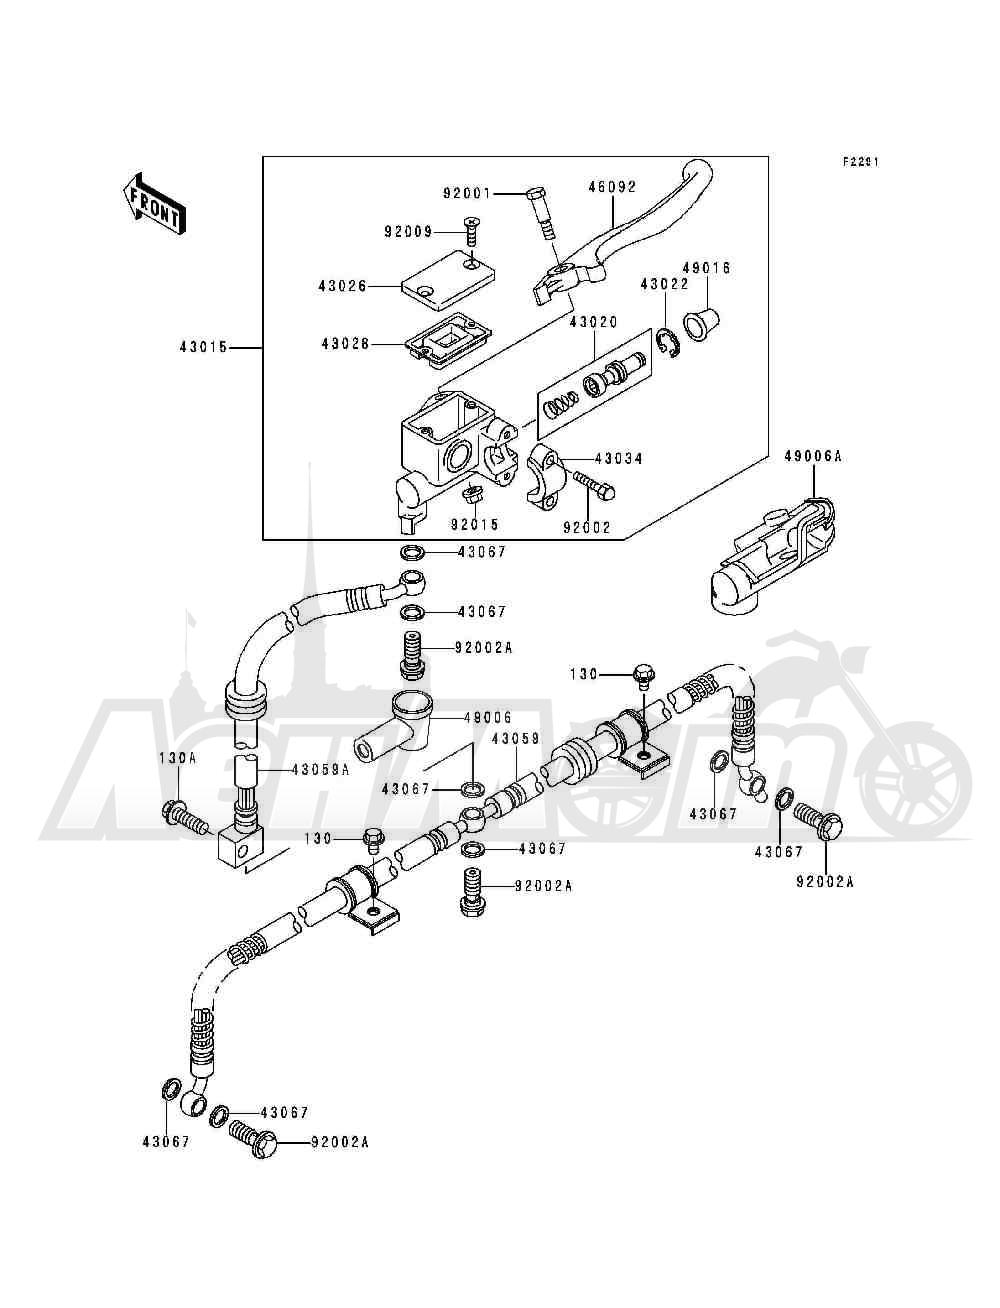 Запчасти для Квадроцикла Kawasaki 1993 BAYOU 300 (KLF300-B6) Раздел: FRONT MASTER CYLINDER | перед главный цилиндр